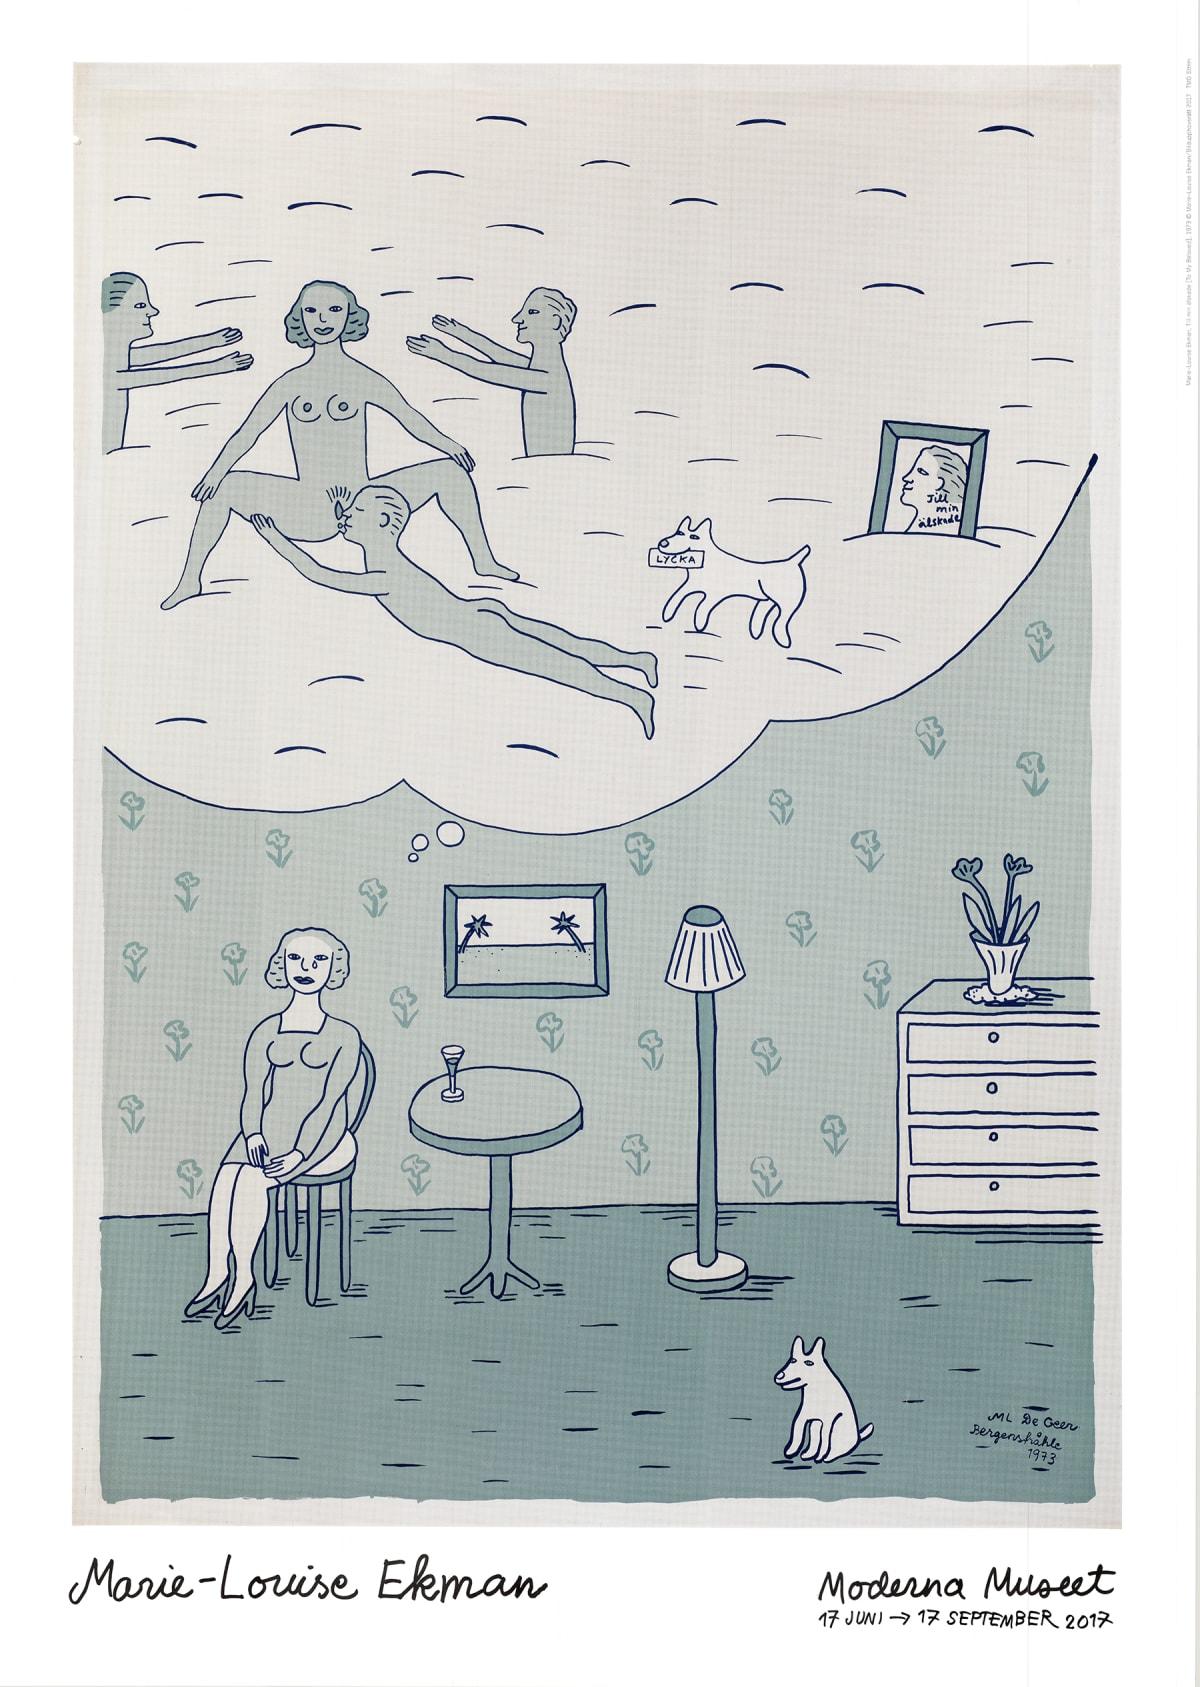 Marie-Louise Ekman Till min älskade (To my beloved), 2017 Poster 19 3/4 x 27 1/2 in 50 x 70 cm